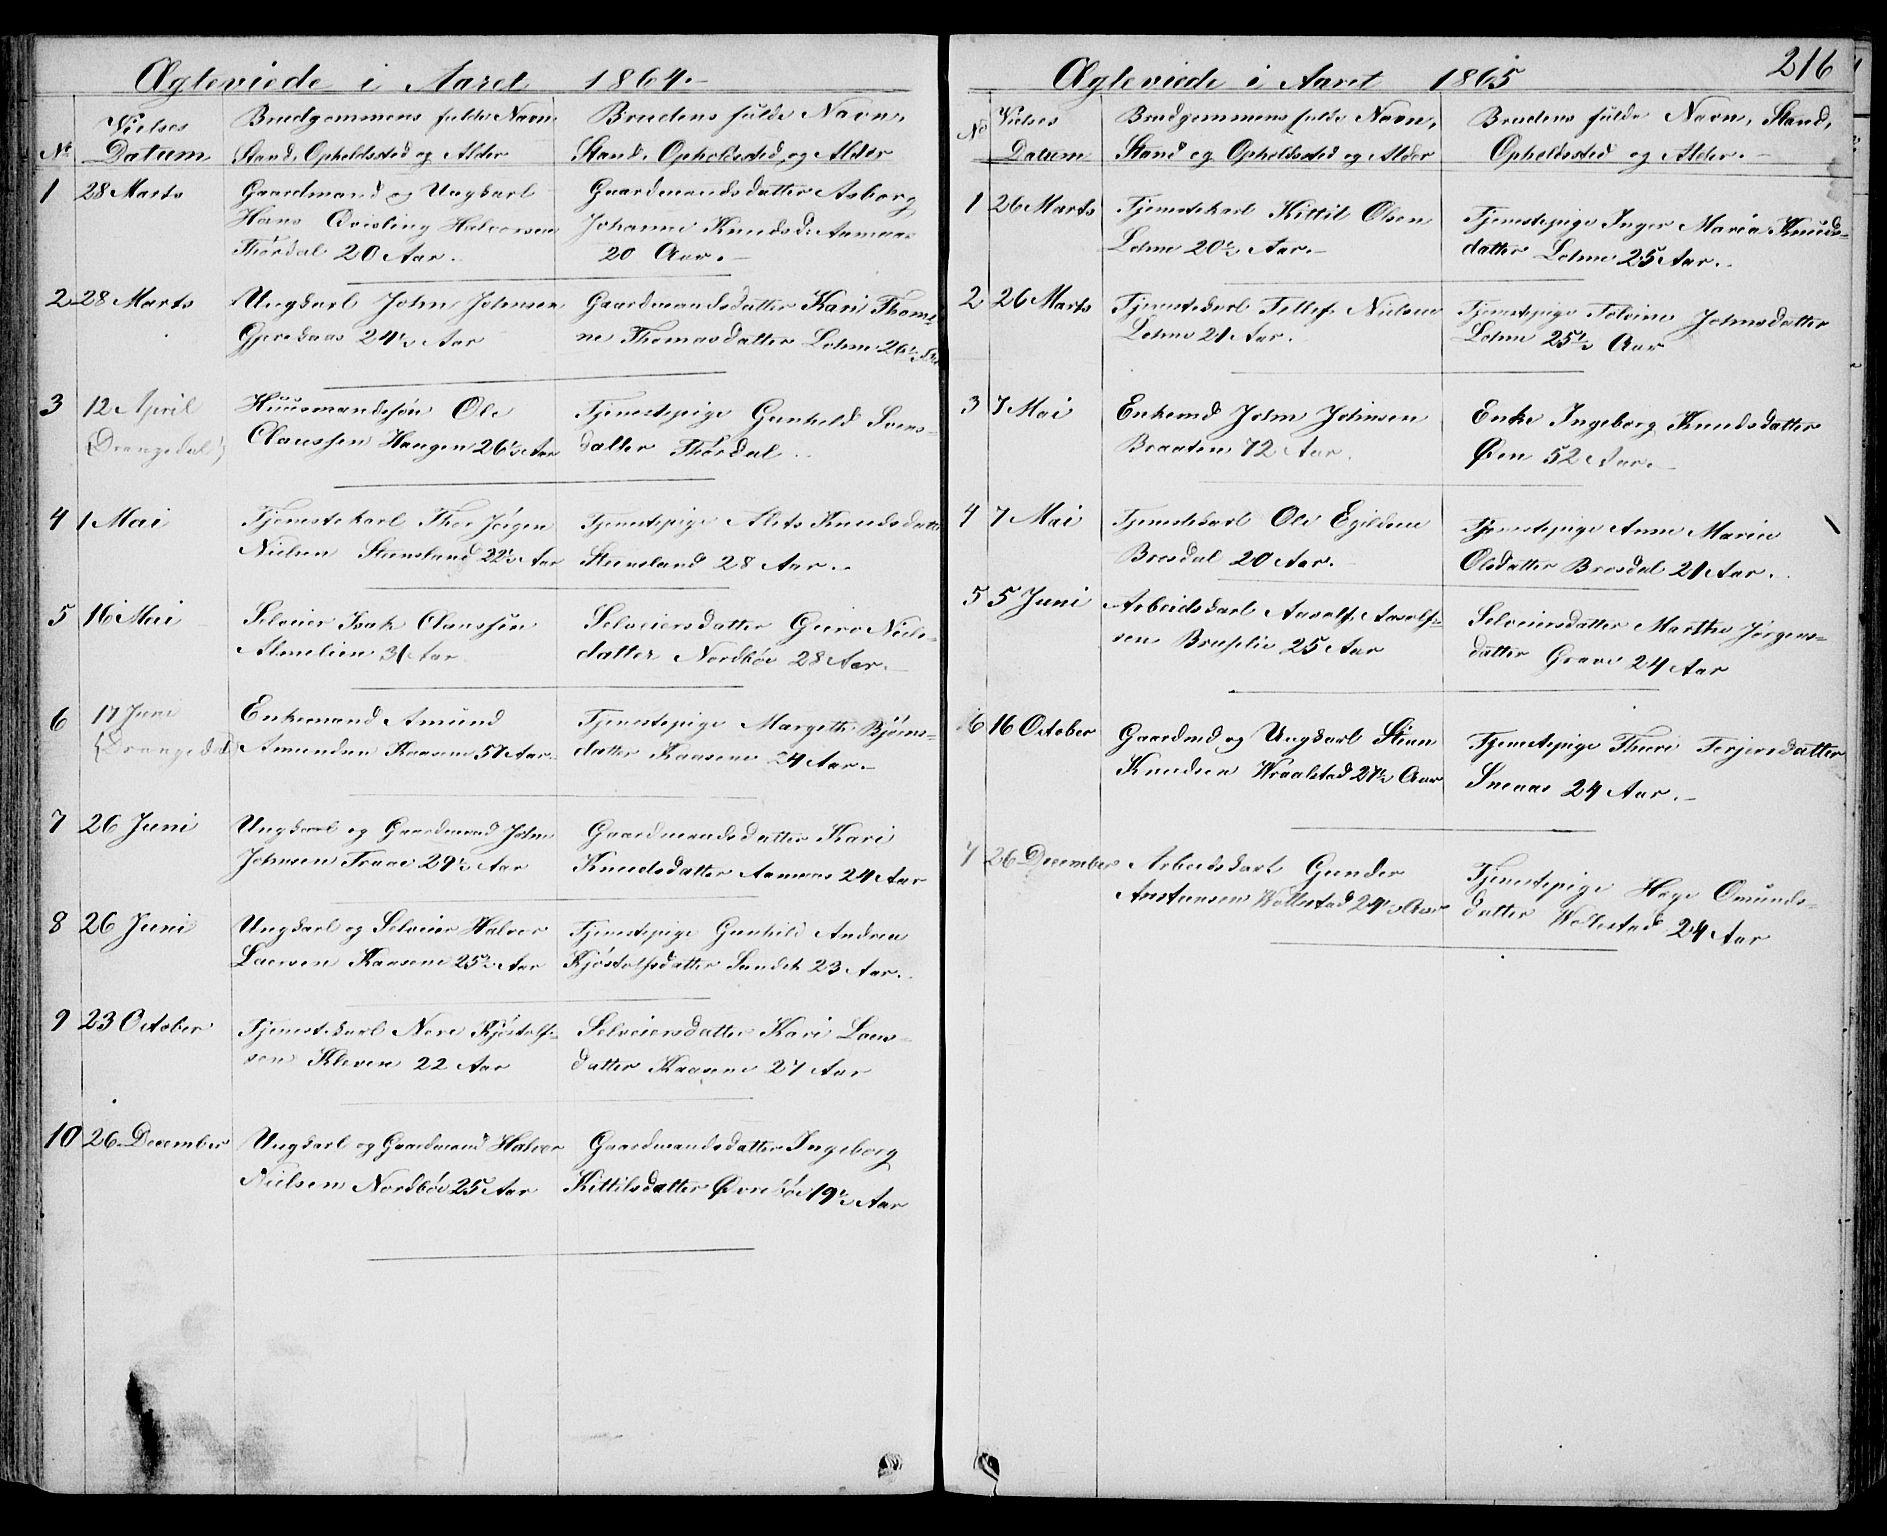 SAKO, Drangedal kirkebøker, G/Gb/L0001: Klokkerbok nr. II 1, 1856-1894, s. 216